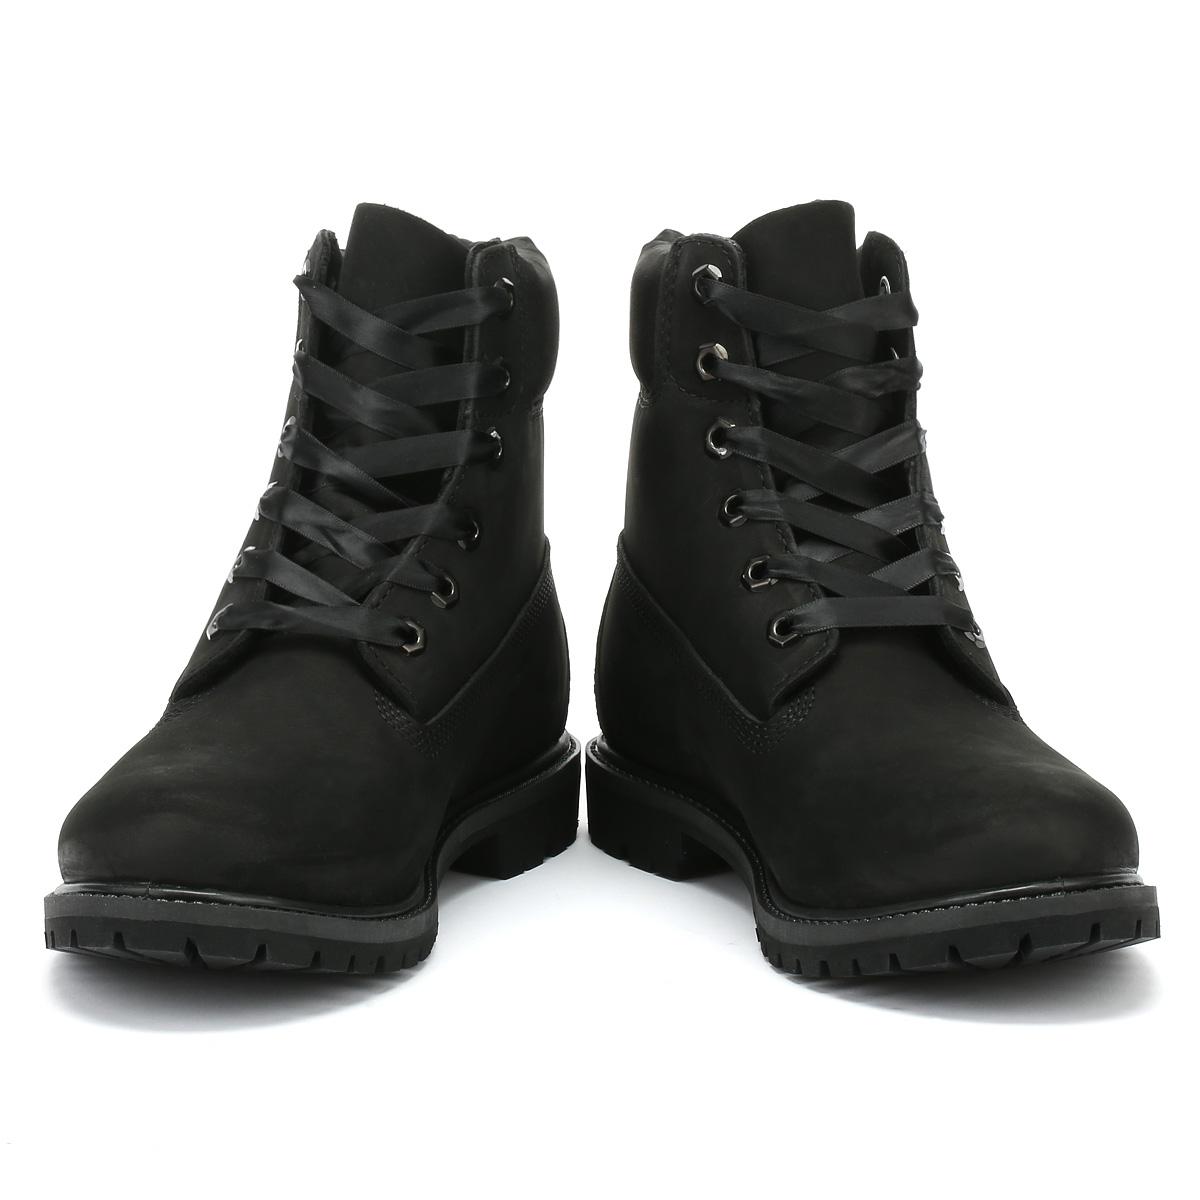 6 INCH PREMIUM Winter boots black